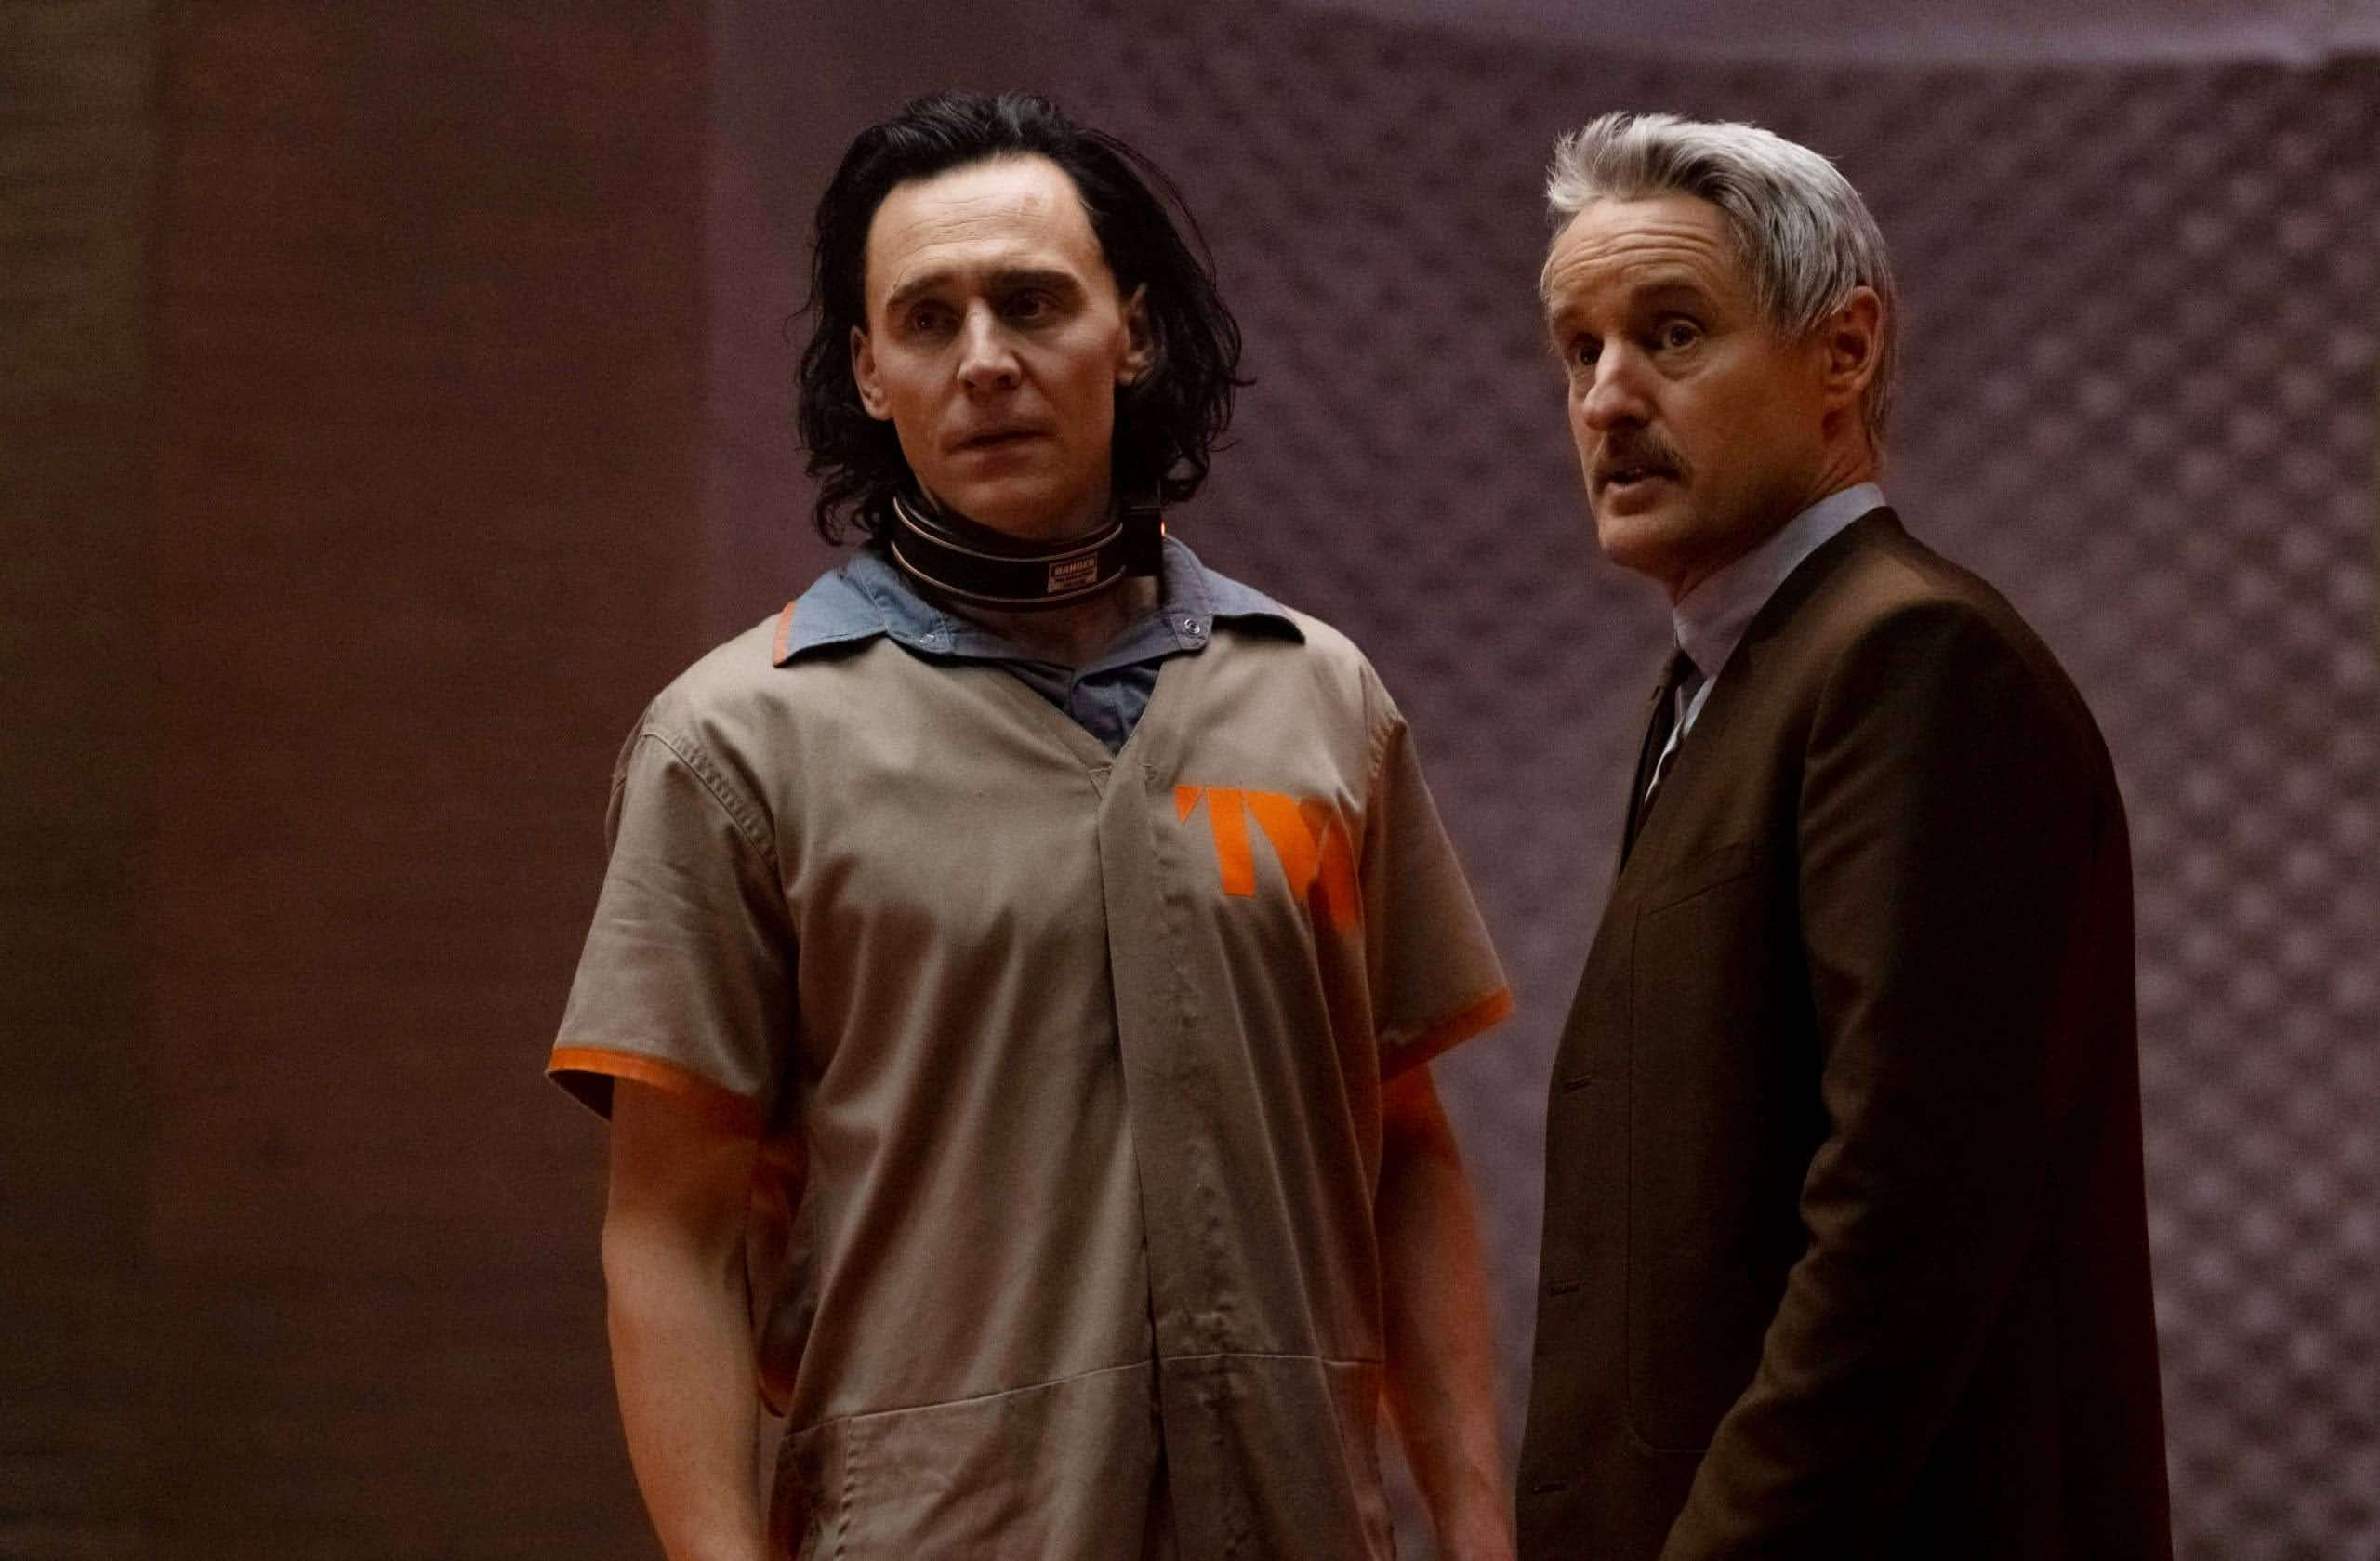 Loki : 憎みきれない悪役のトムさん初登場から10周年記念の単独主演のスピンオフの配信シリーズ「ロキ」の新しい予告編 ! !